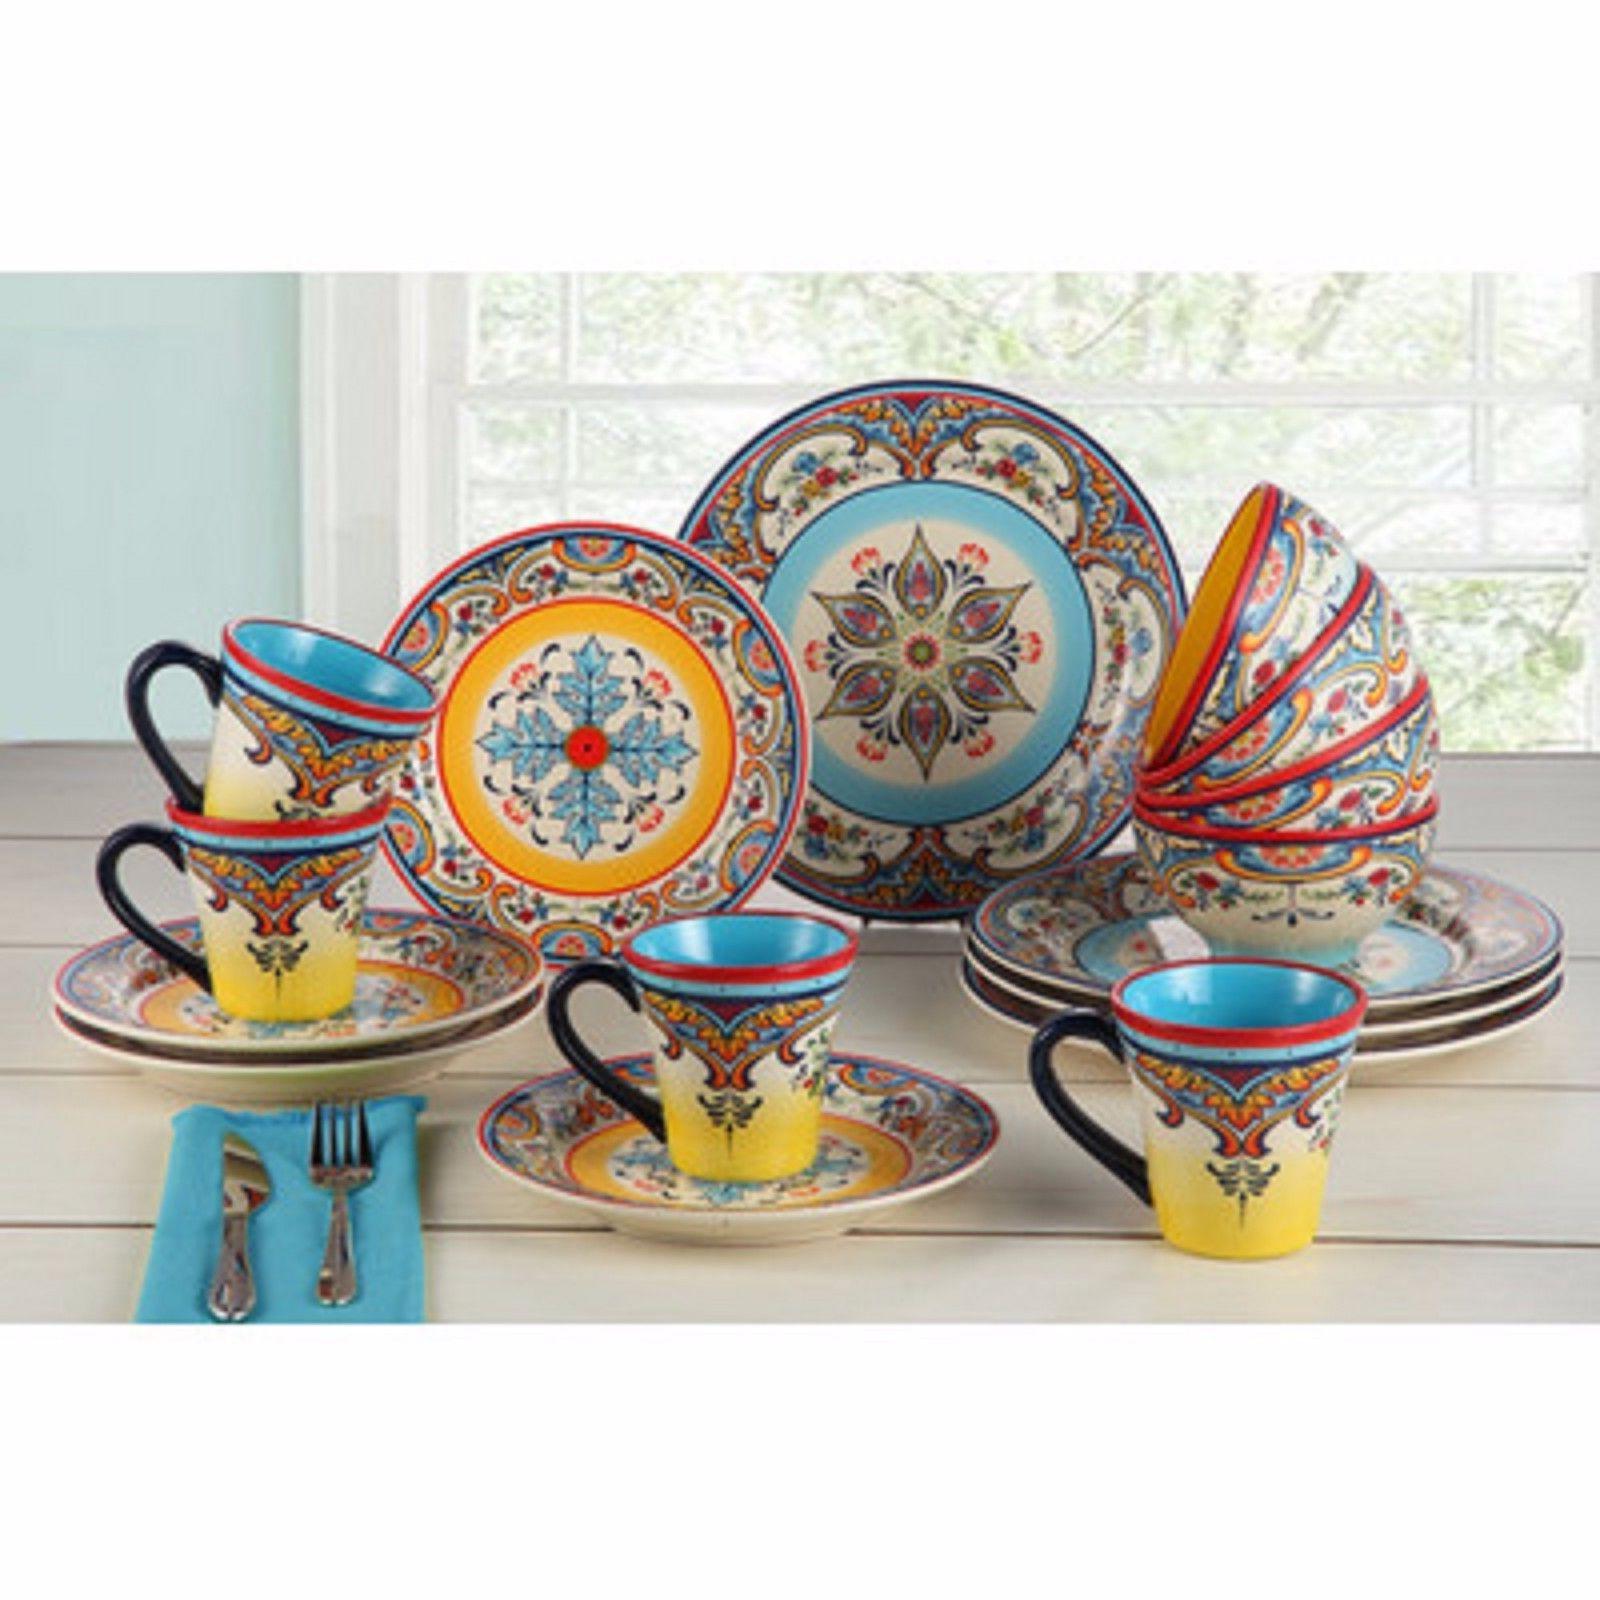 Dinnerware Set EuroCeramica Zanzibar 16 Dishes Cups Bowl